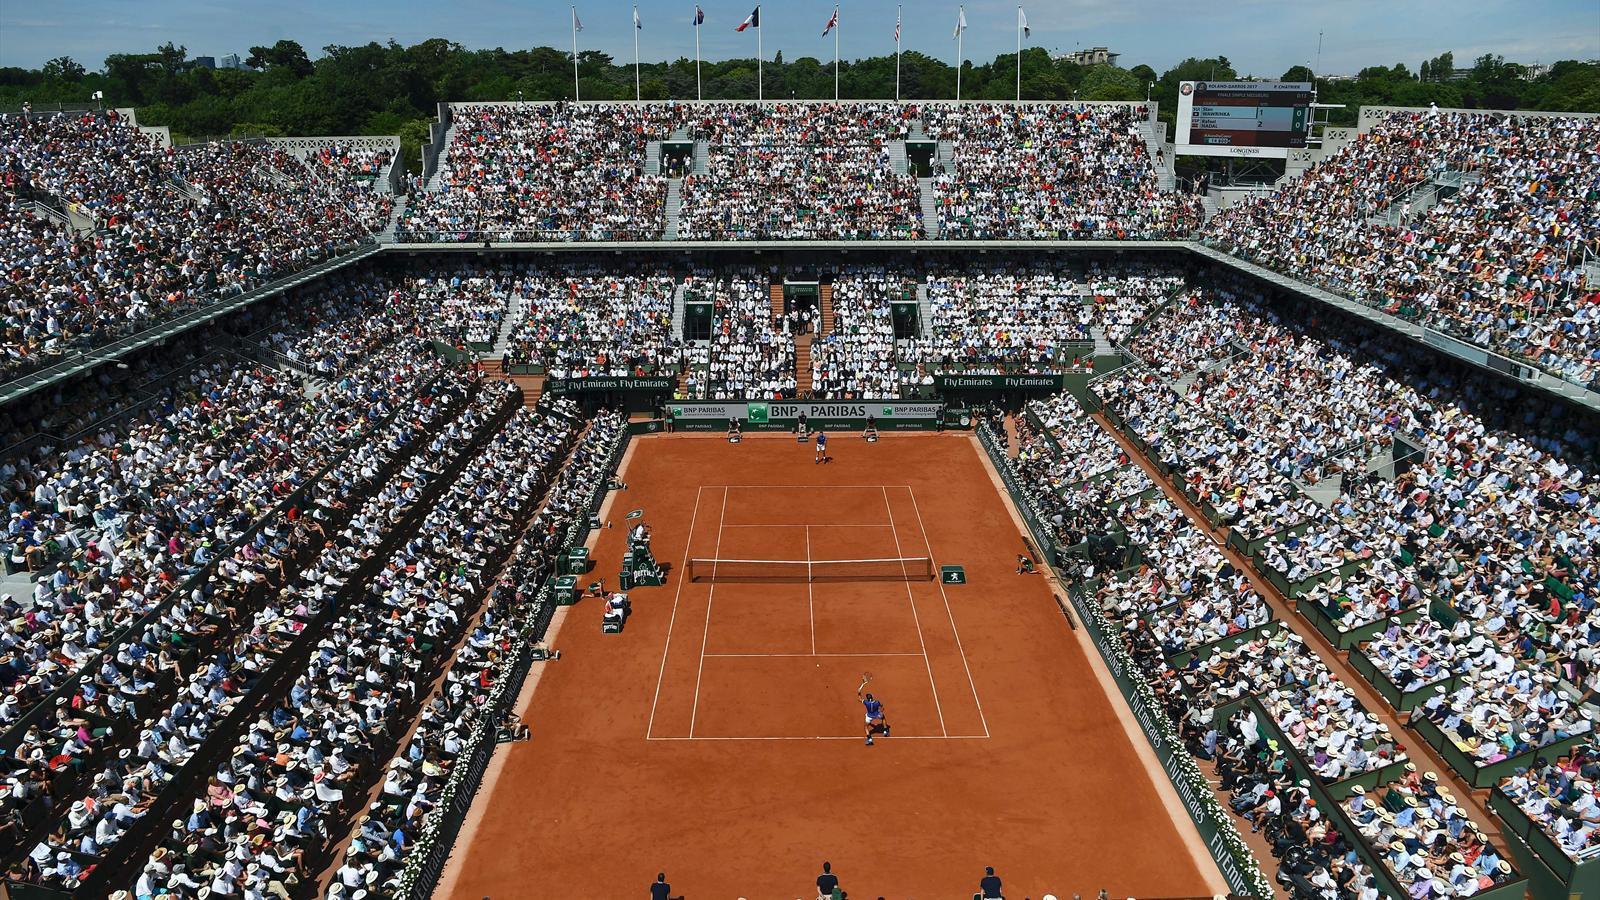 Roland Garros French Open 2018 Tennis Eurosport